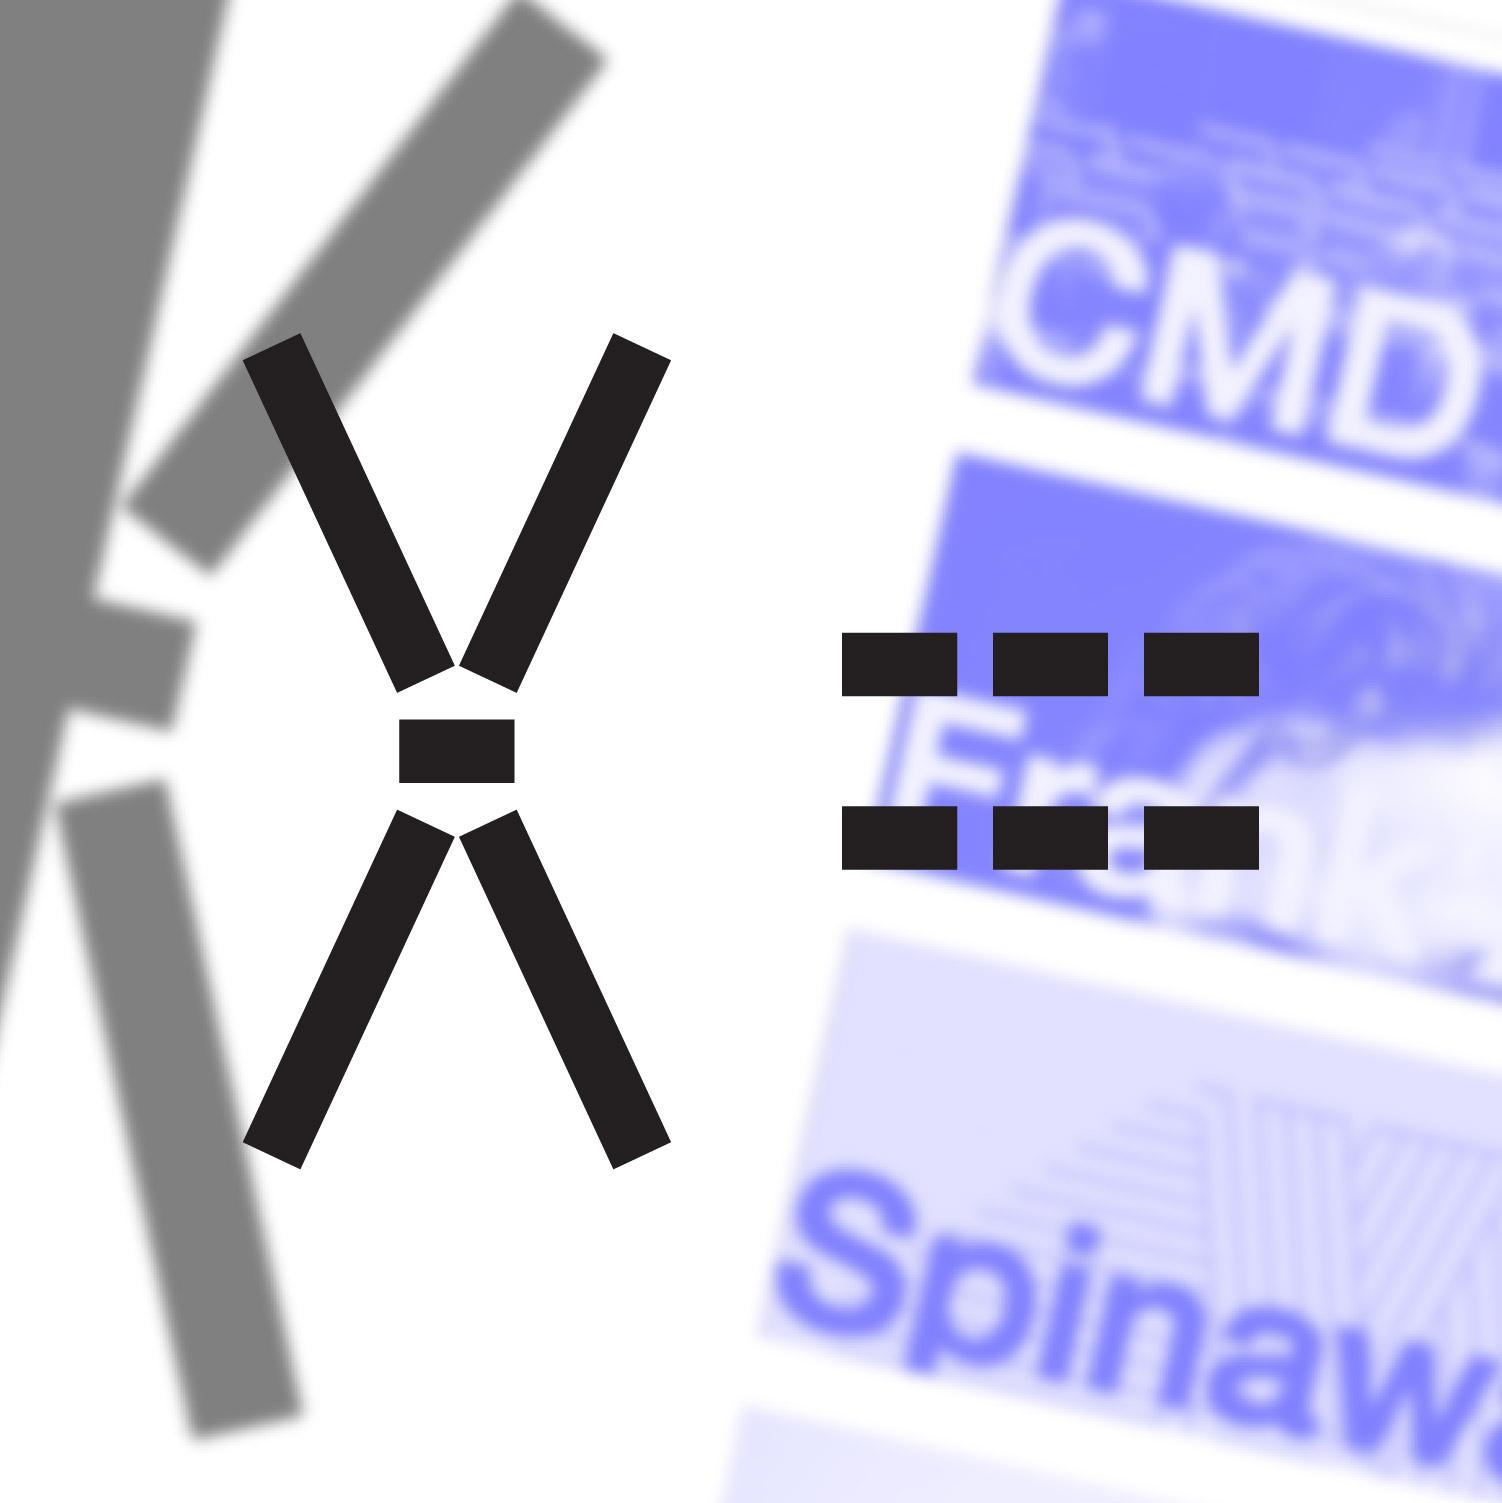 X=Festival | Evenement Website